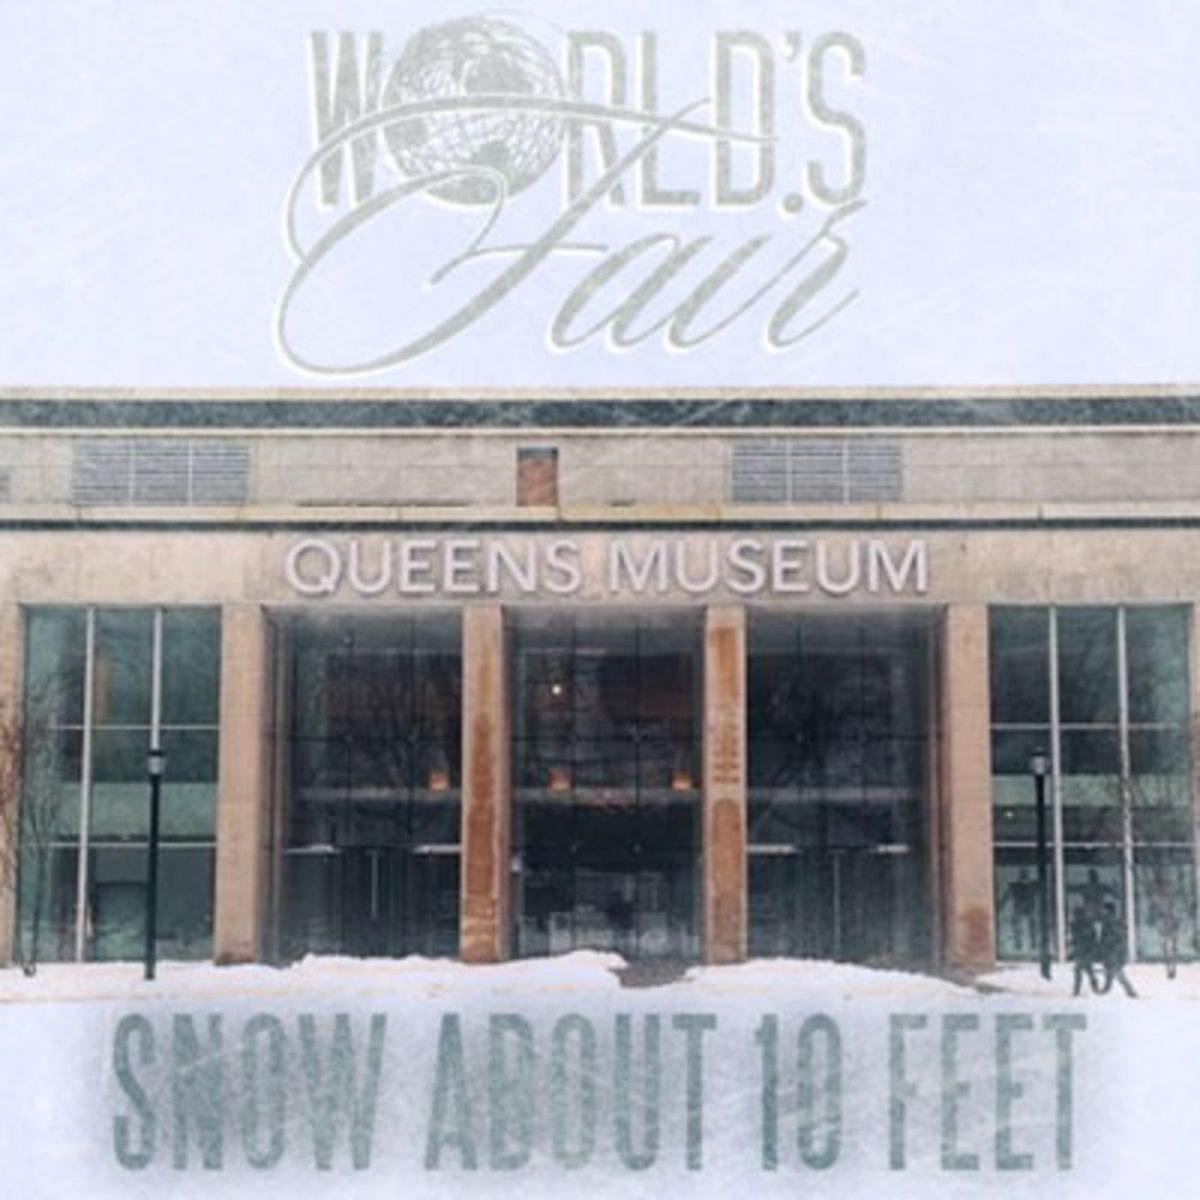 worldsfair-snowabout.jpg